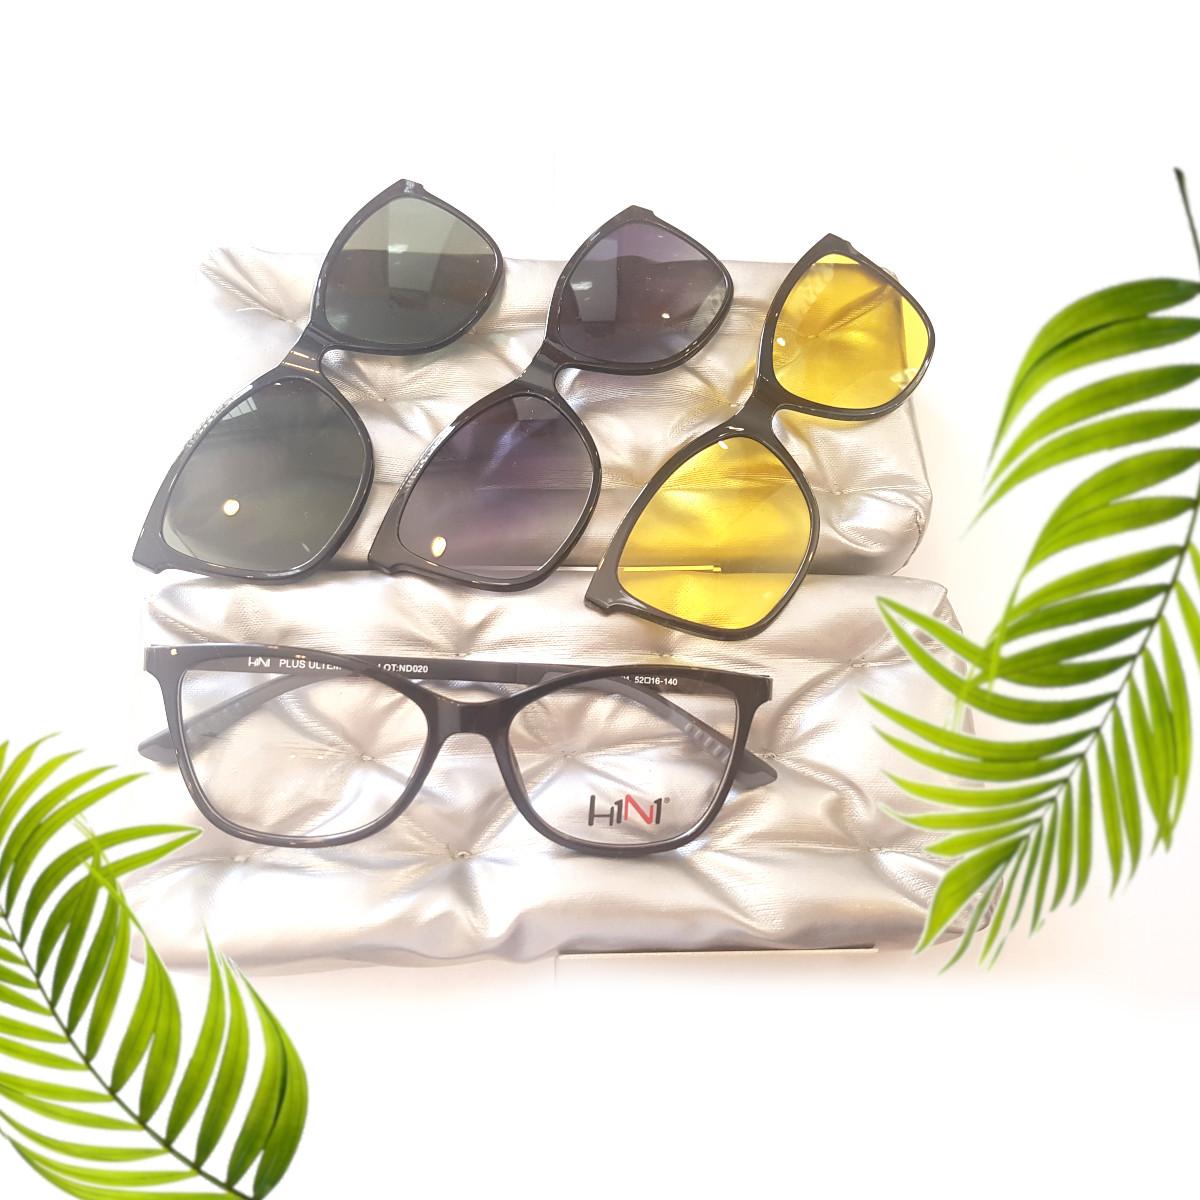 Rainbow H1N1 trc018 – okulary z 3 nakładkami